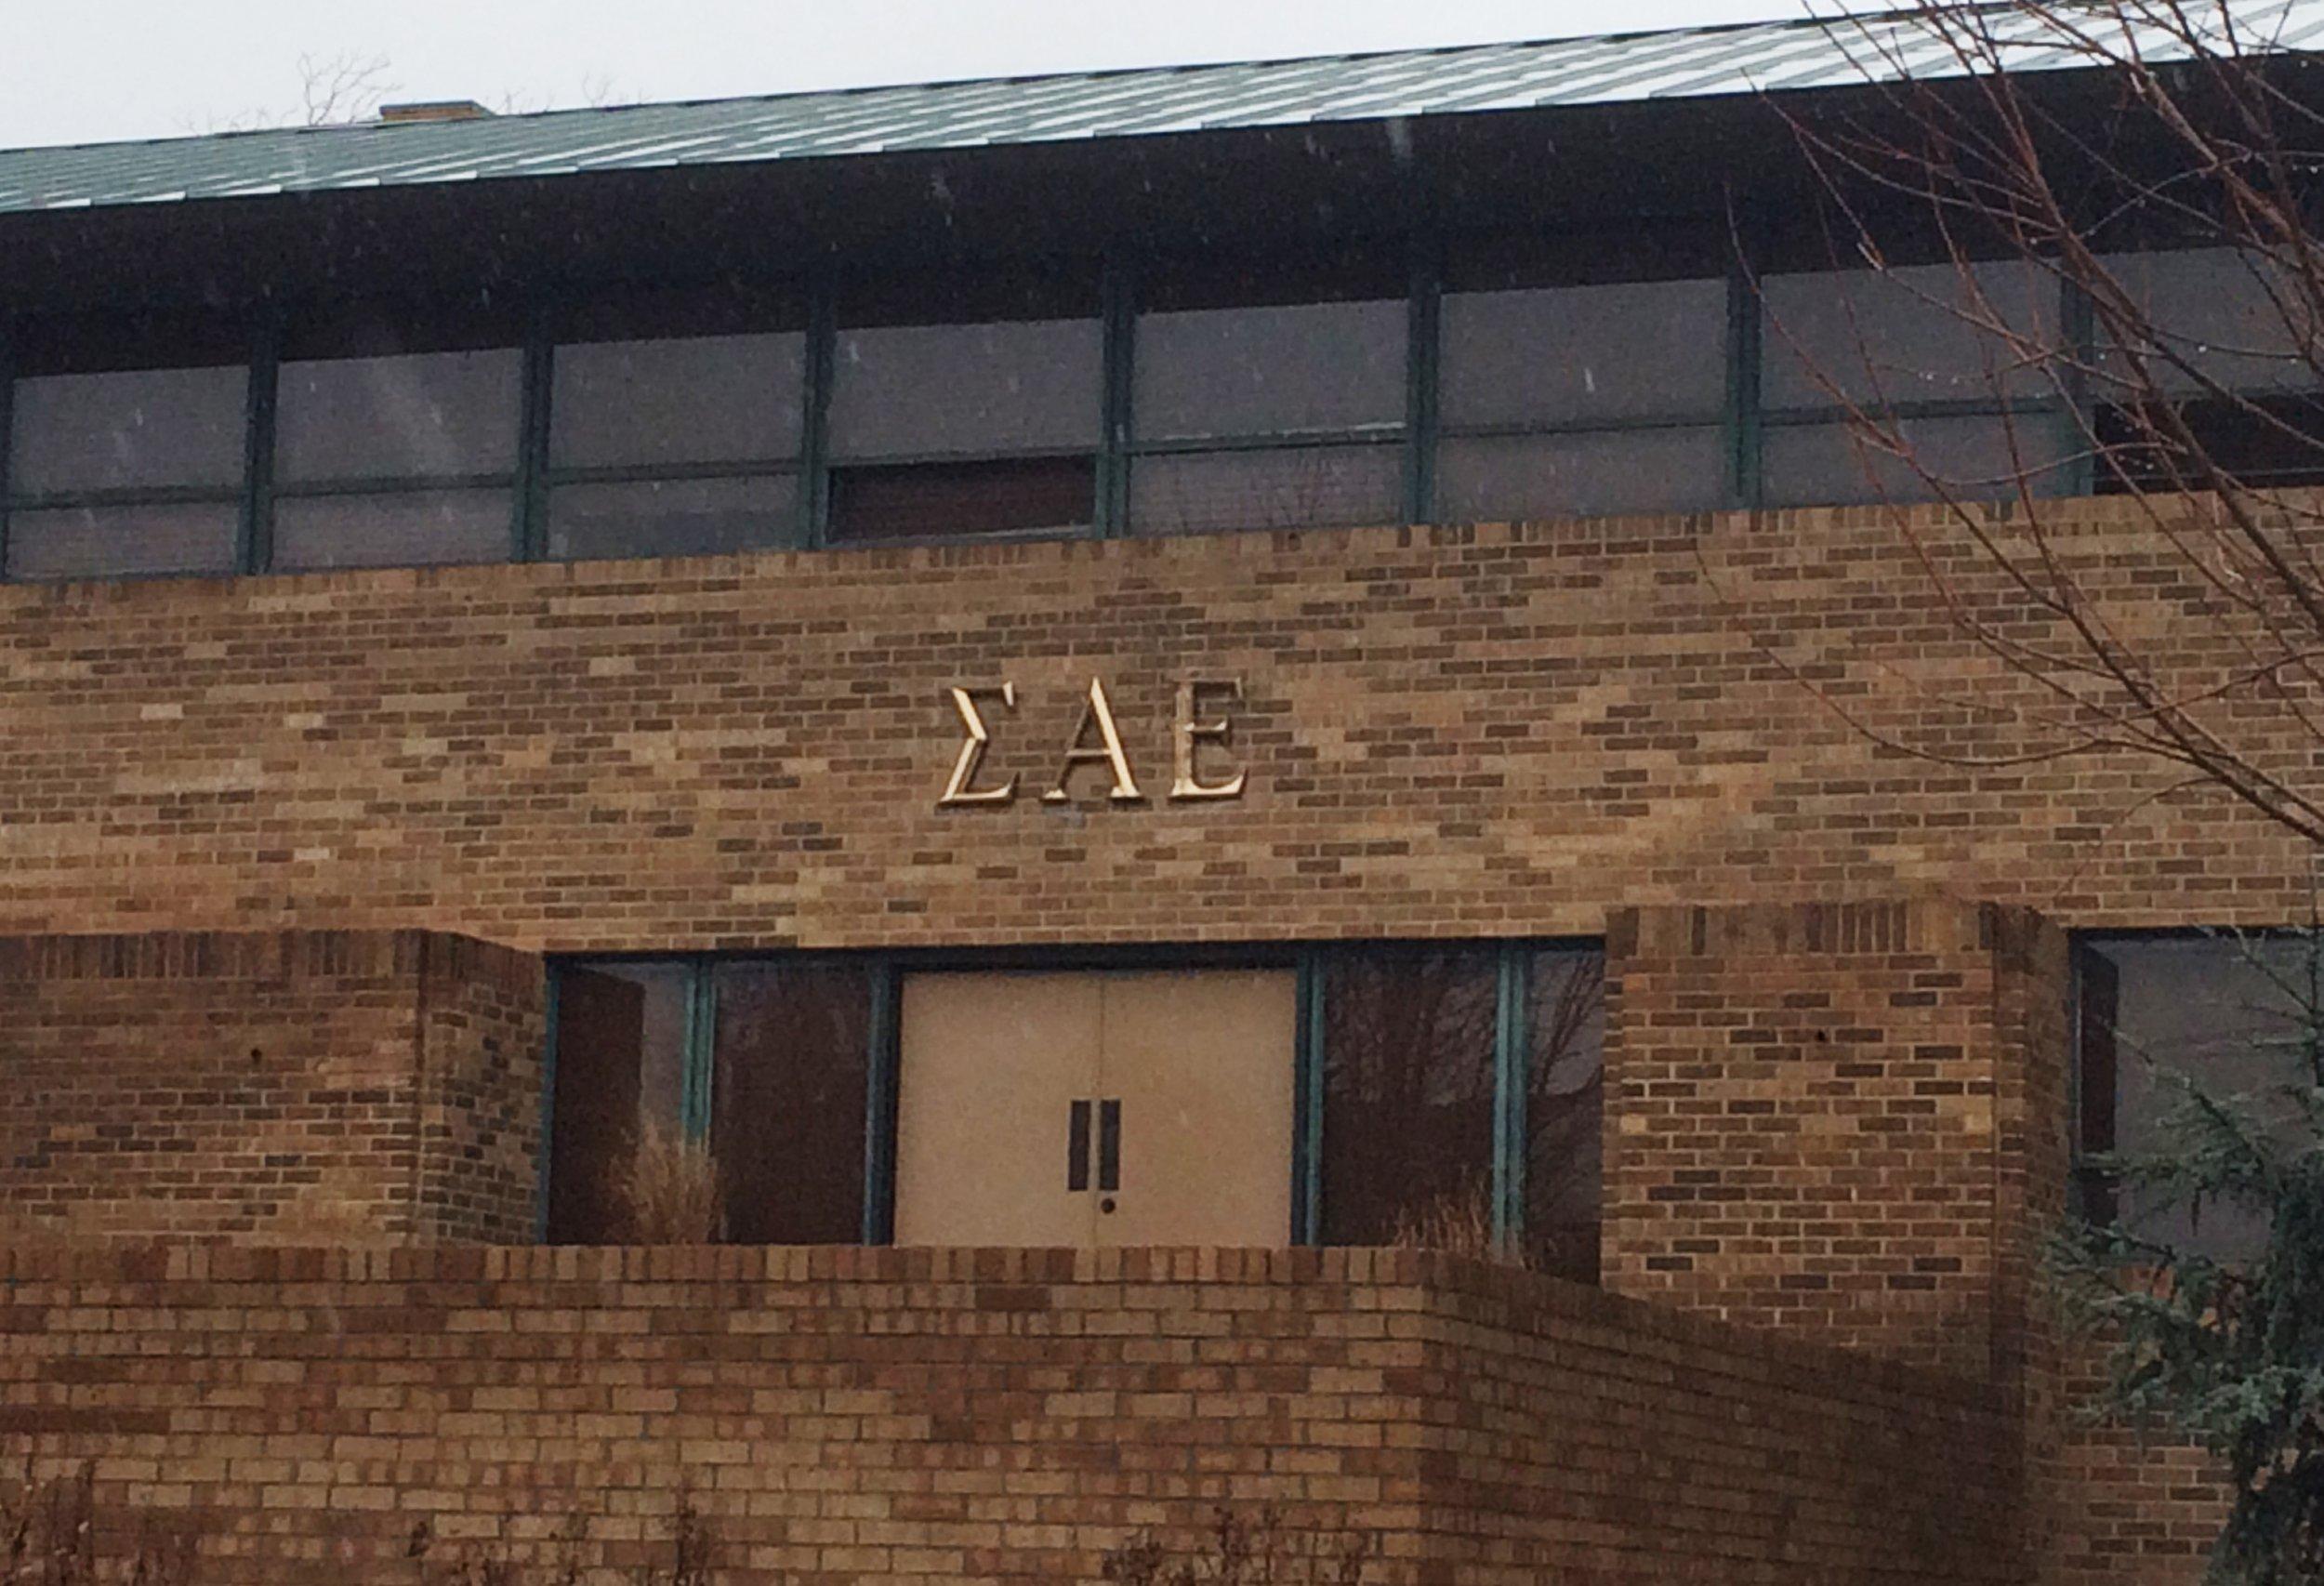 University of Oklahoma SAE